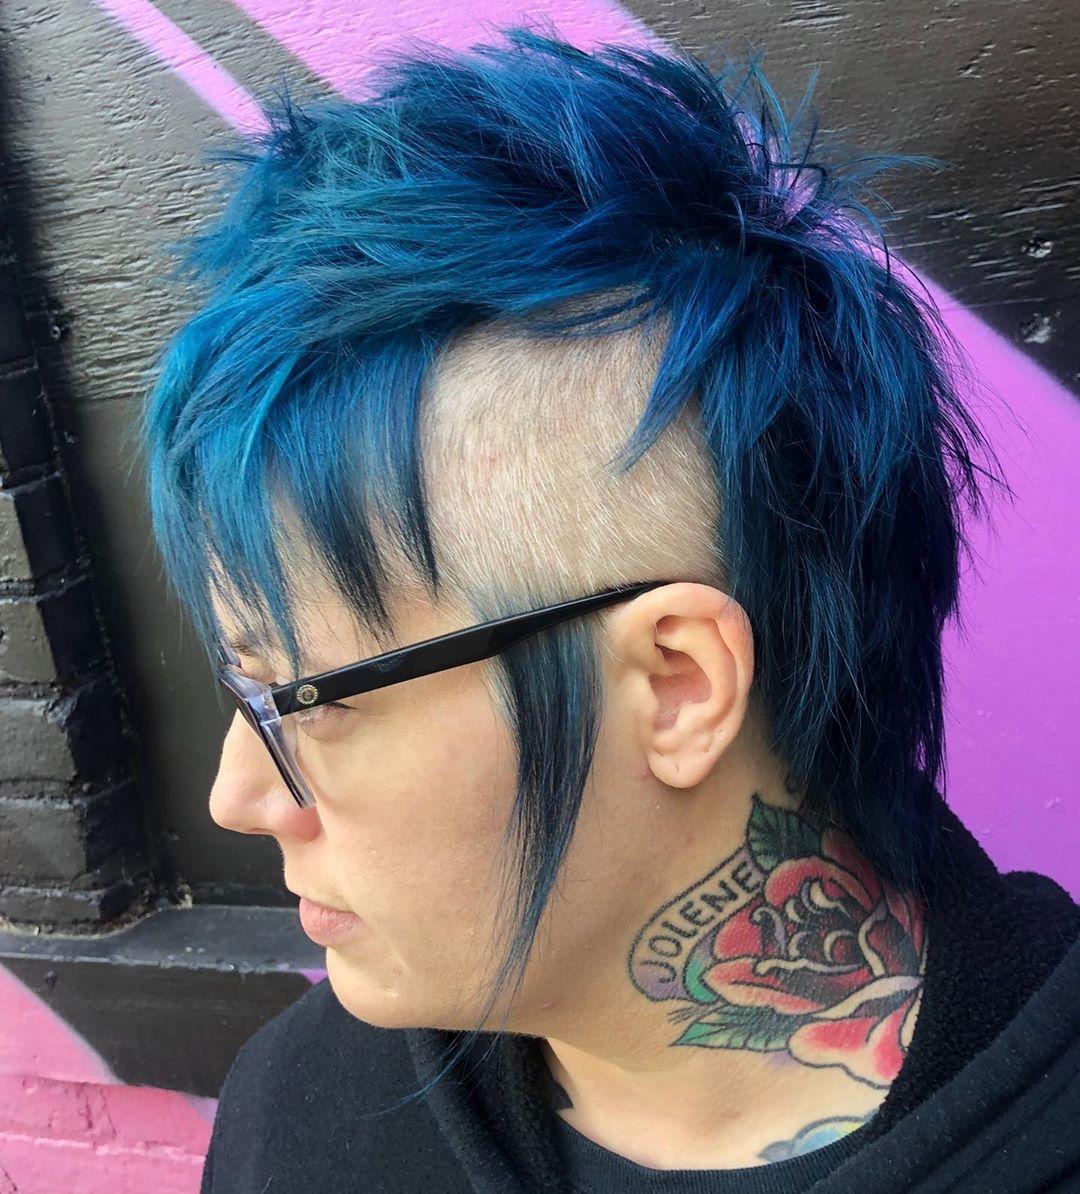 Daring fantasy blue short hairstyle